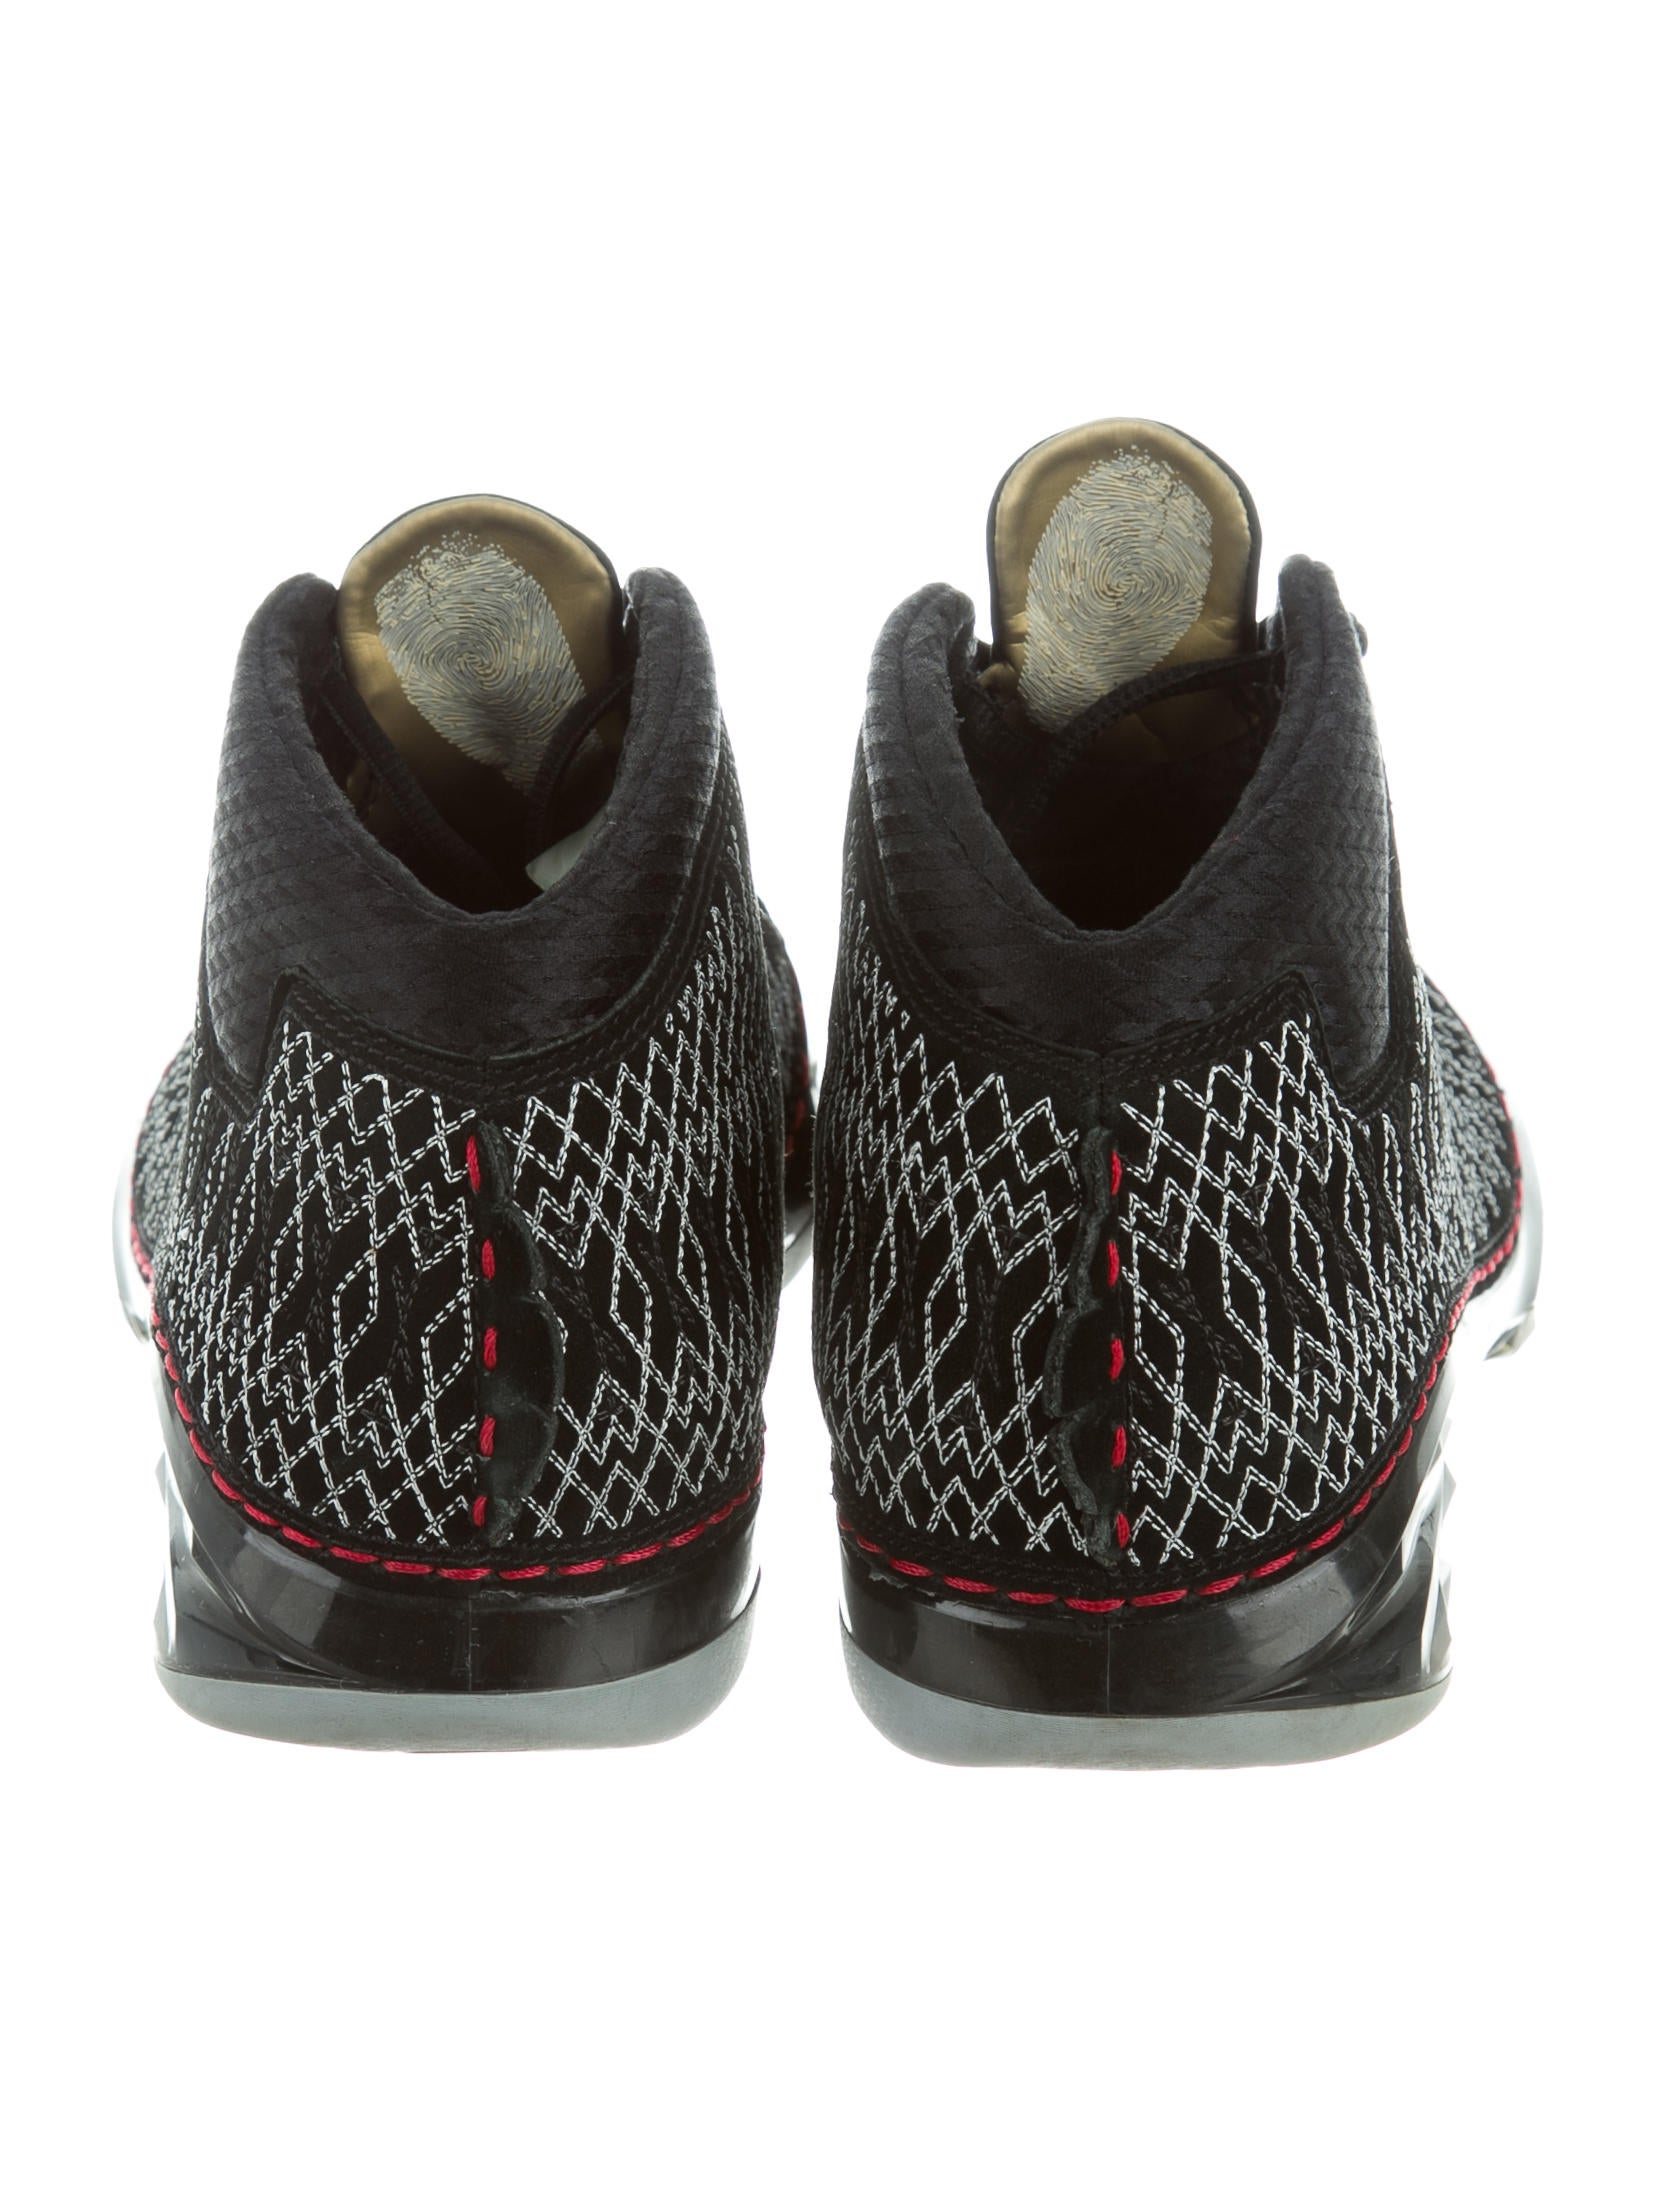 360341842d5b Air Jordan 12 Rising Sun Men Shoes Brands